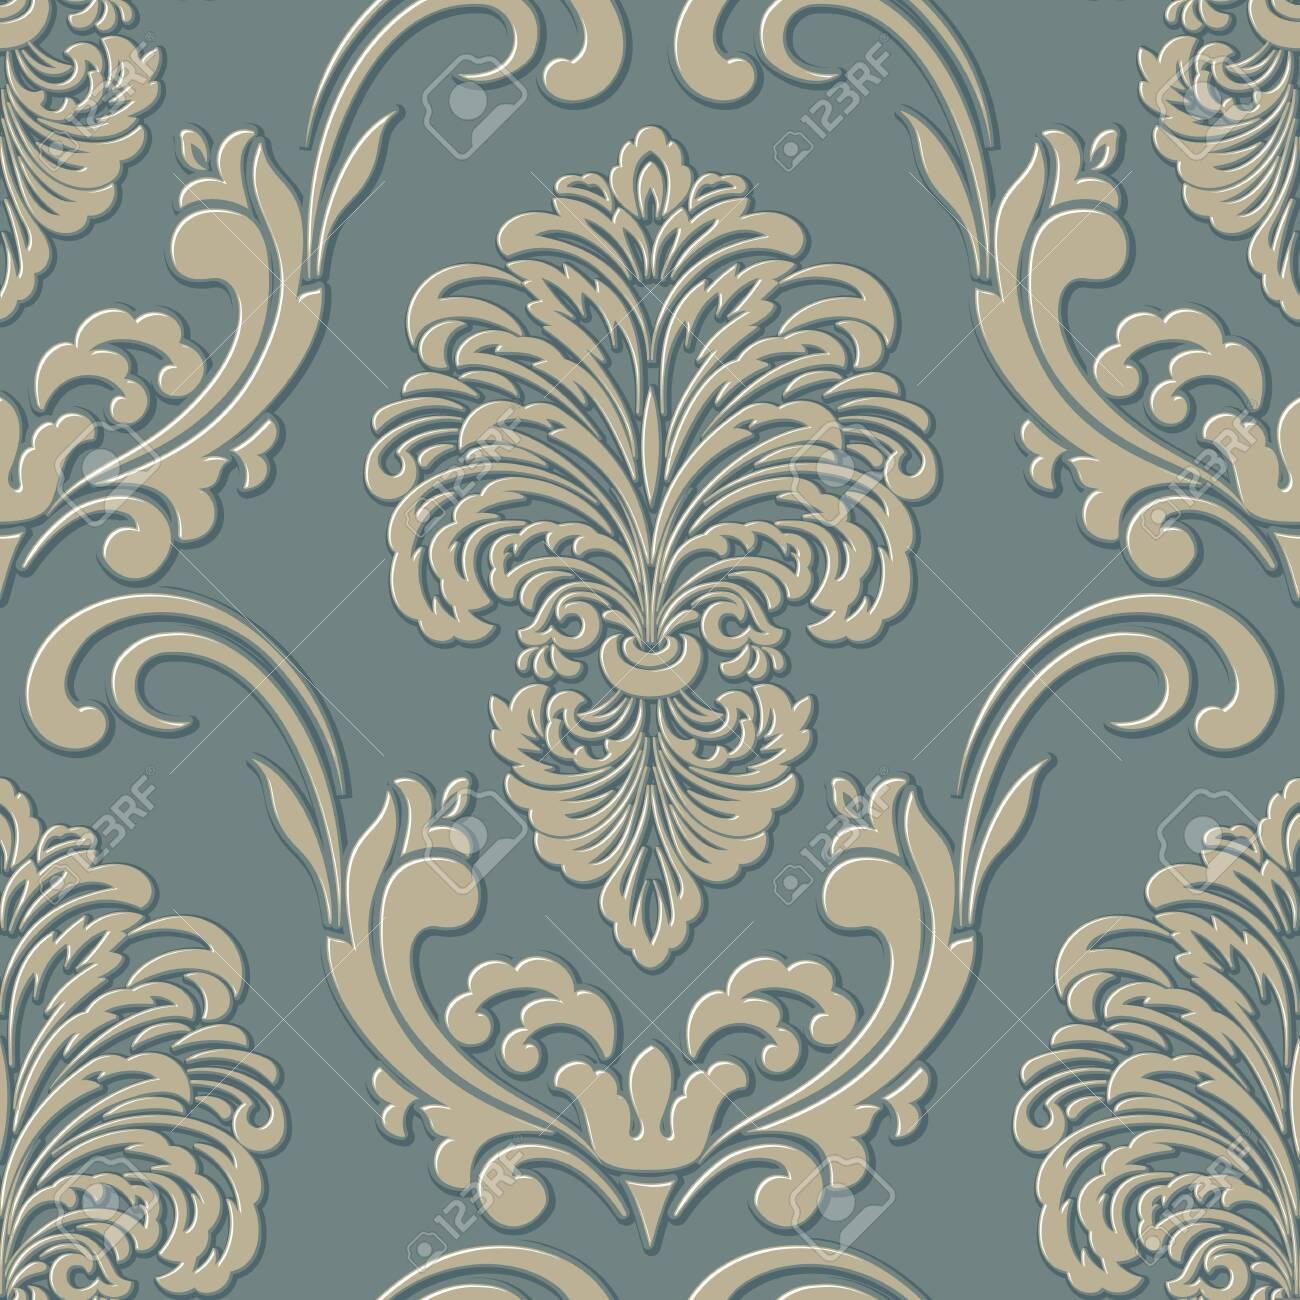 damask seamless pattern background. Classical luxury old fashioned damask ornament. - 126629788